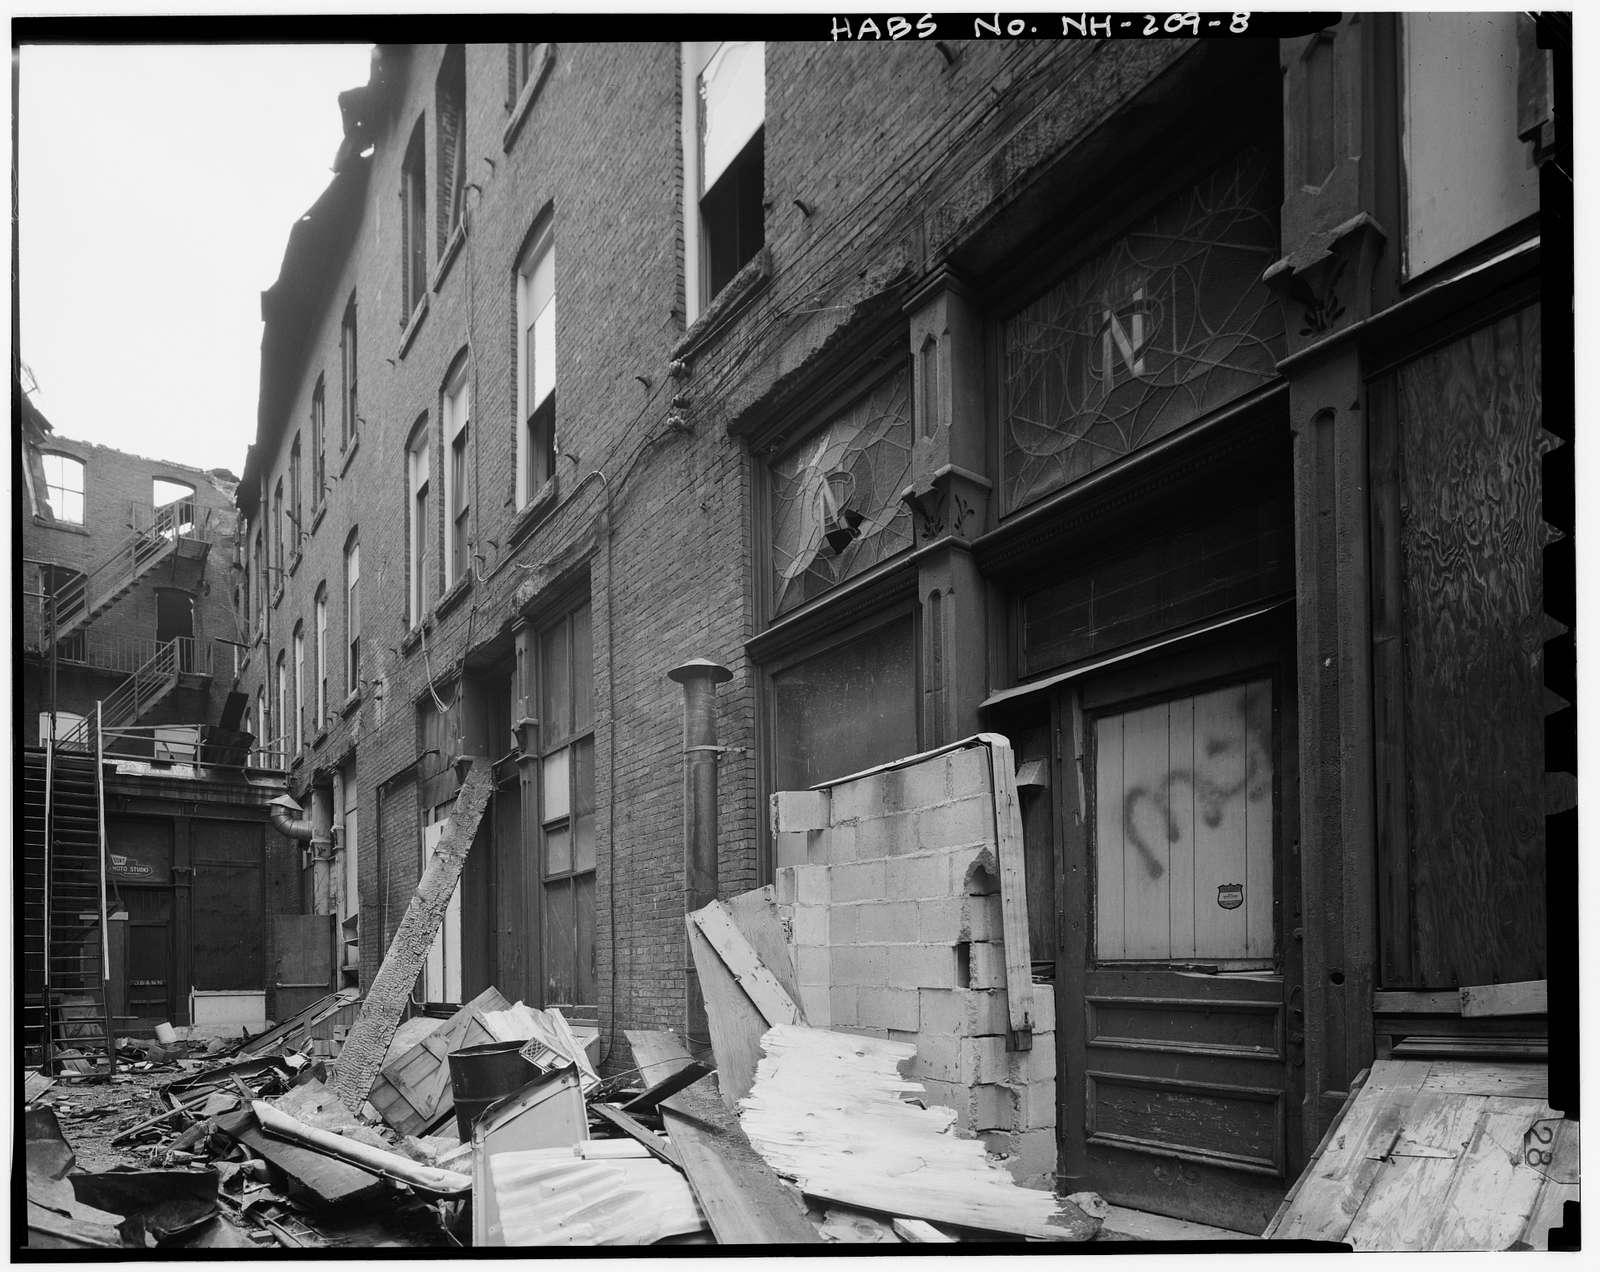 Harrington-Smith Block, 18-52 Hanover Street, Manchester, Hillsborough County, NH